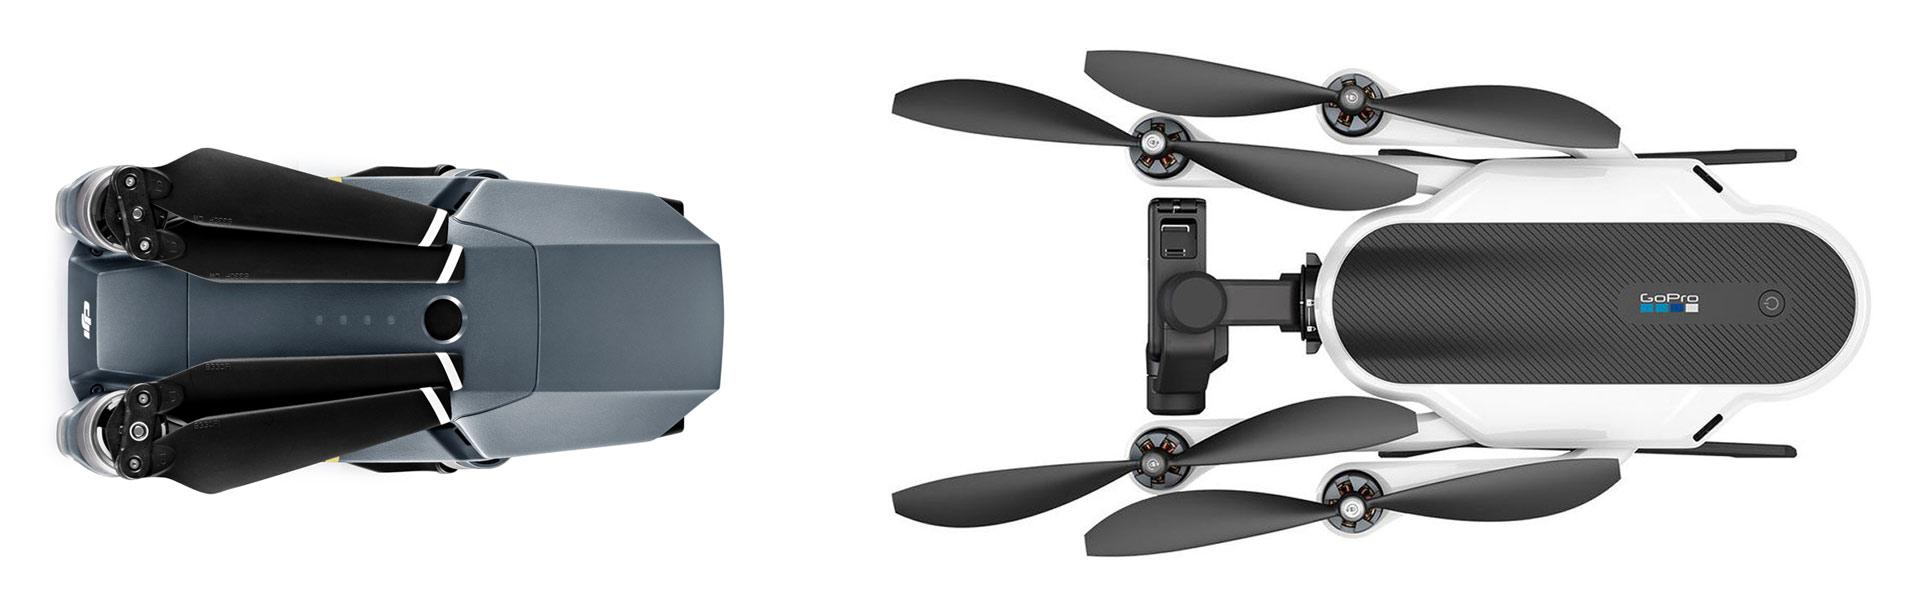 Mavic air combo with gopro hero 3 колпачки для моторов dji видео обзор